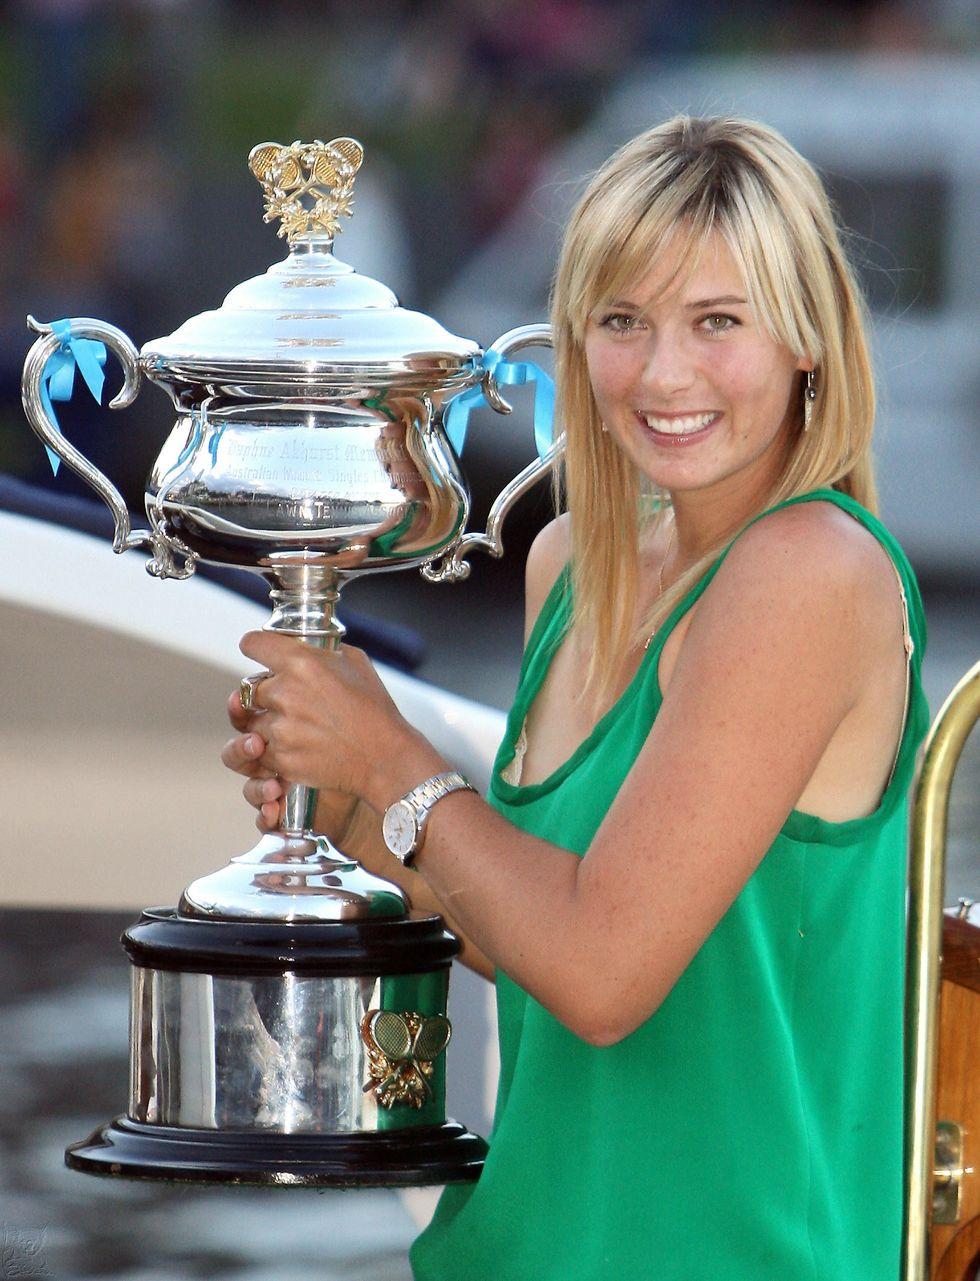 maria-sharapova-posing-with-australian-open-championship-trophy-01